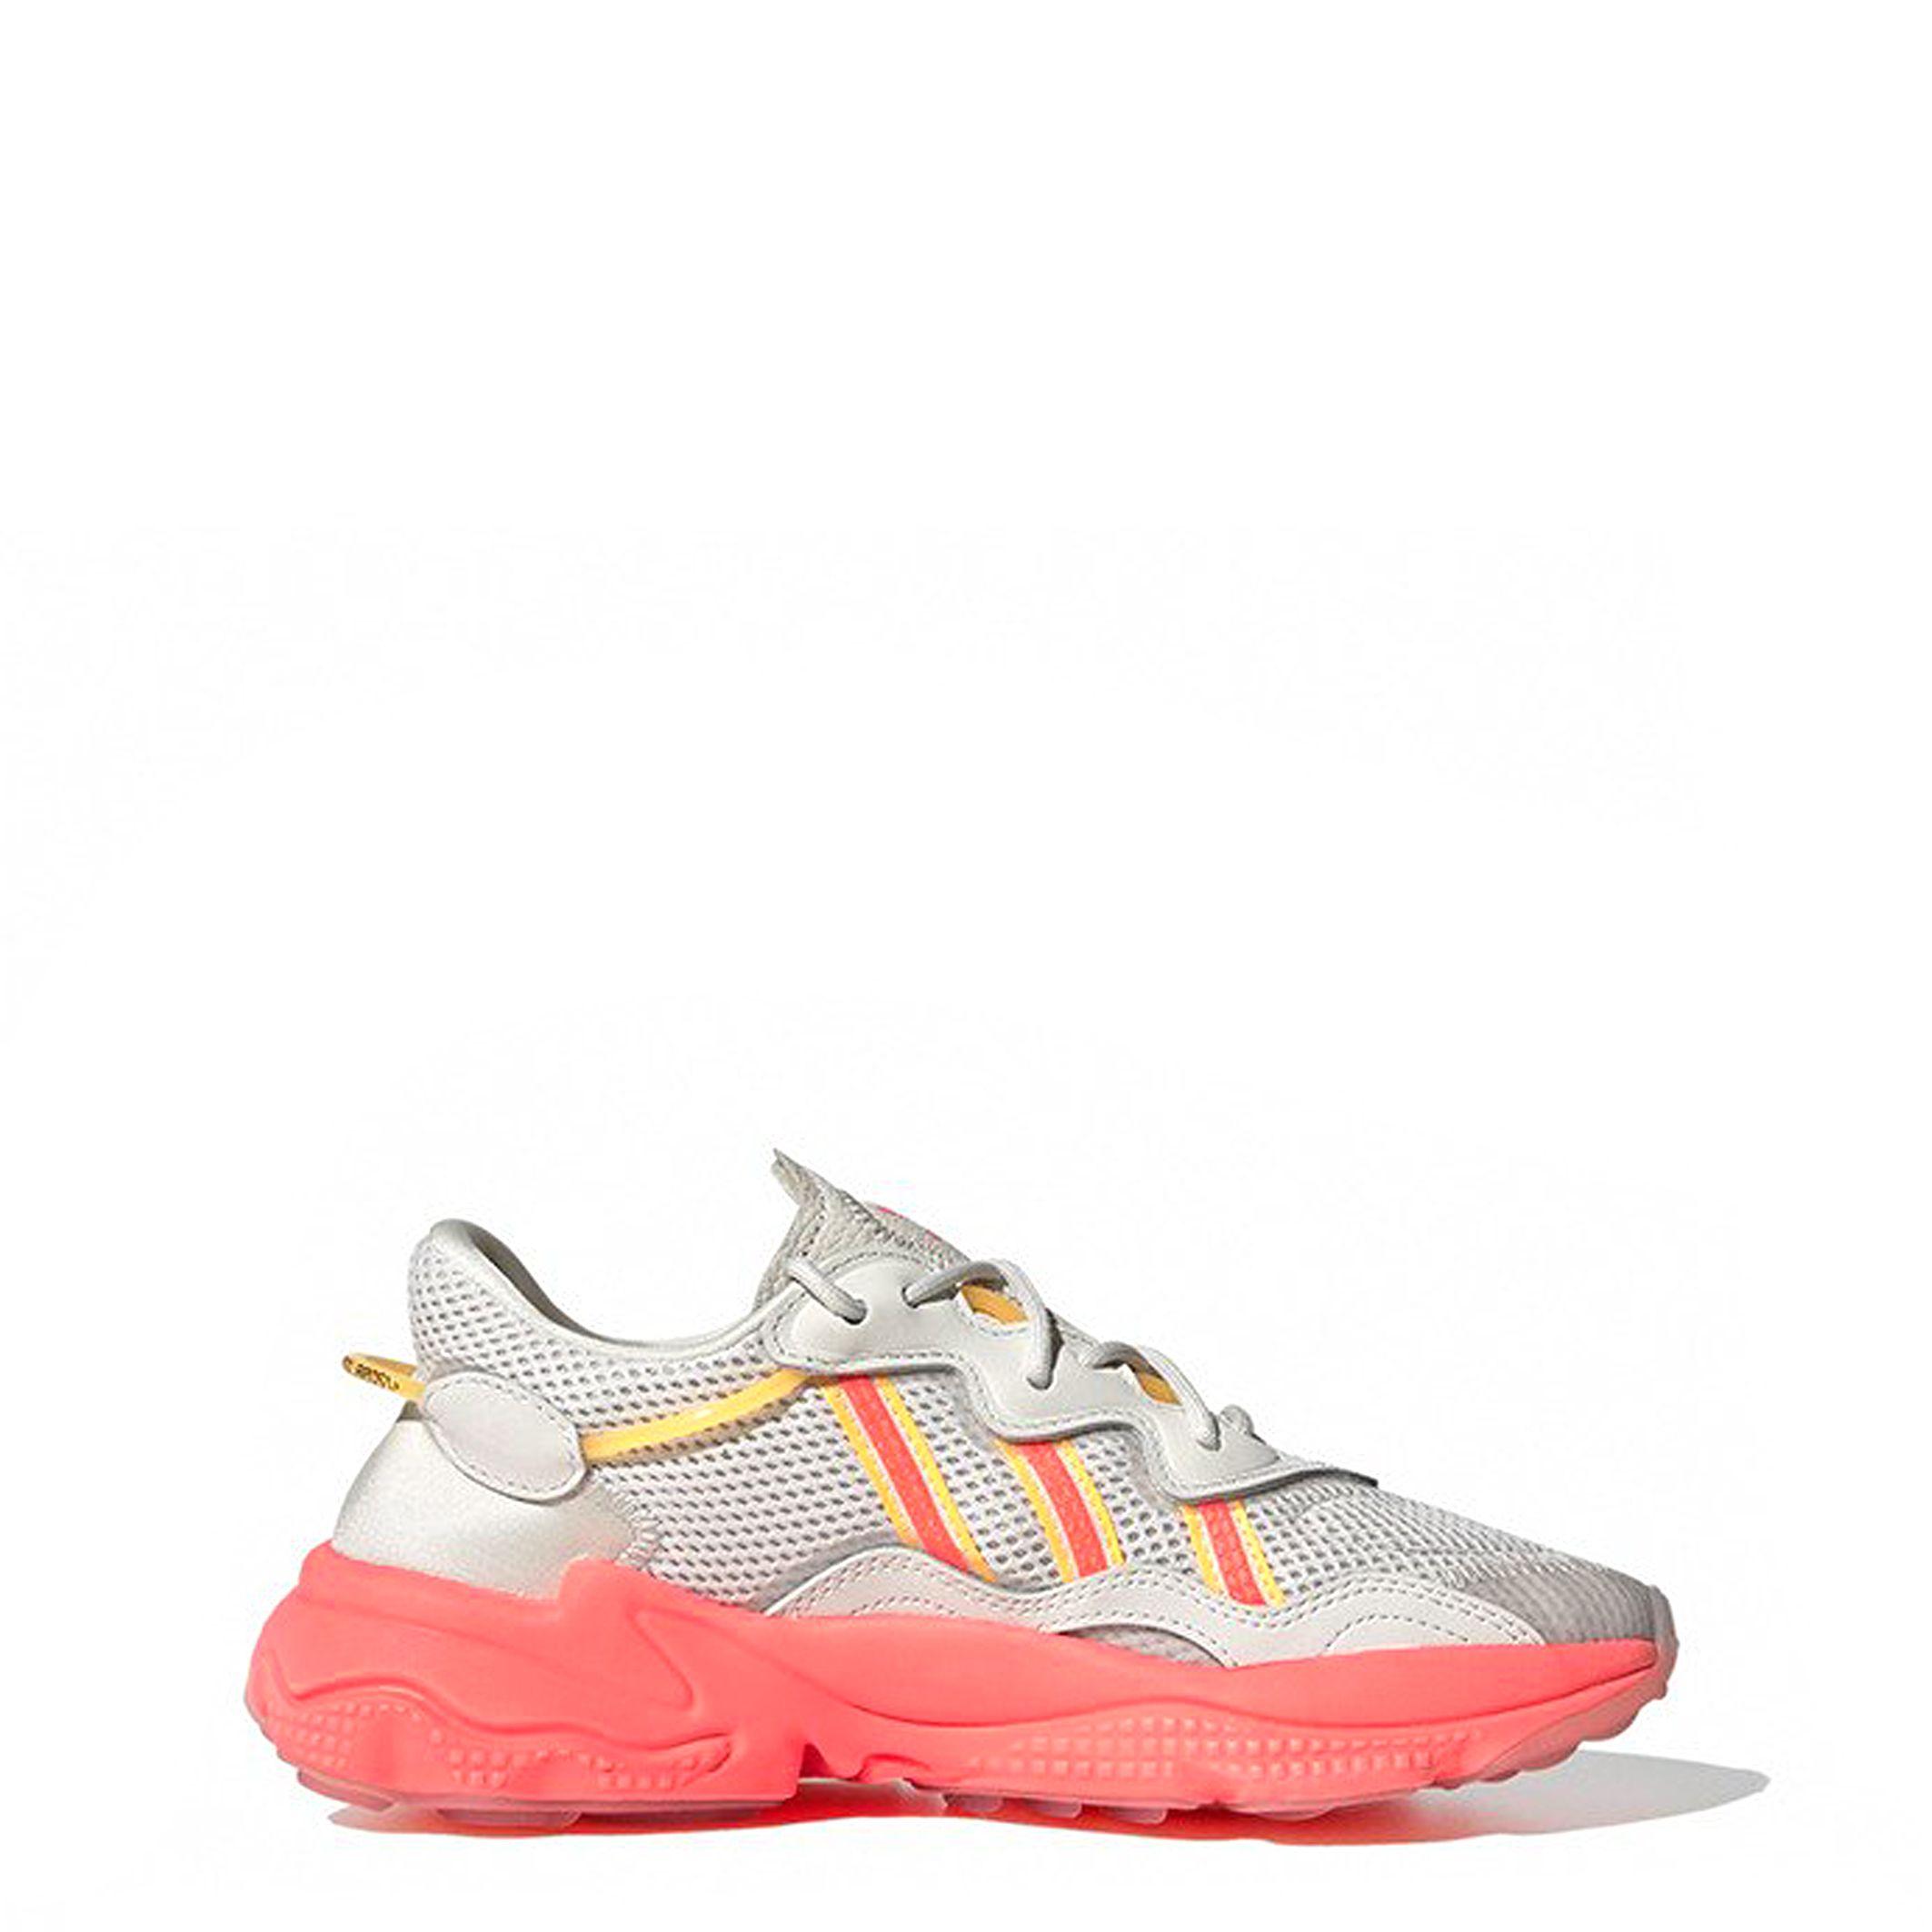 Chaussures Adidas – Ozweego